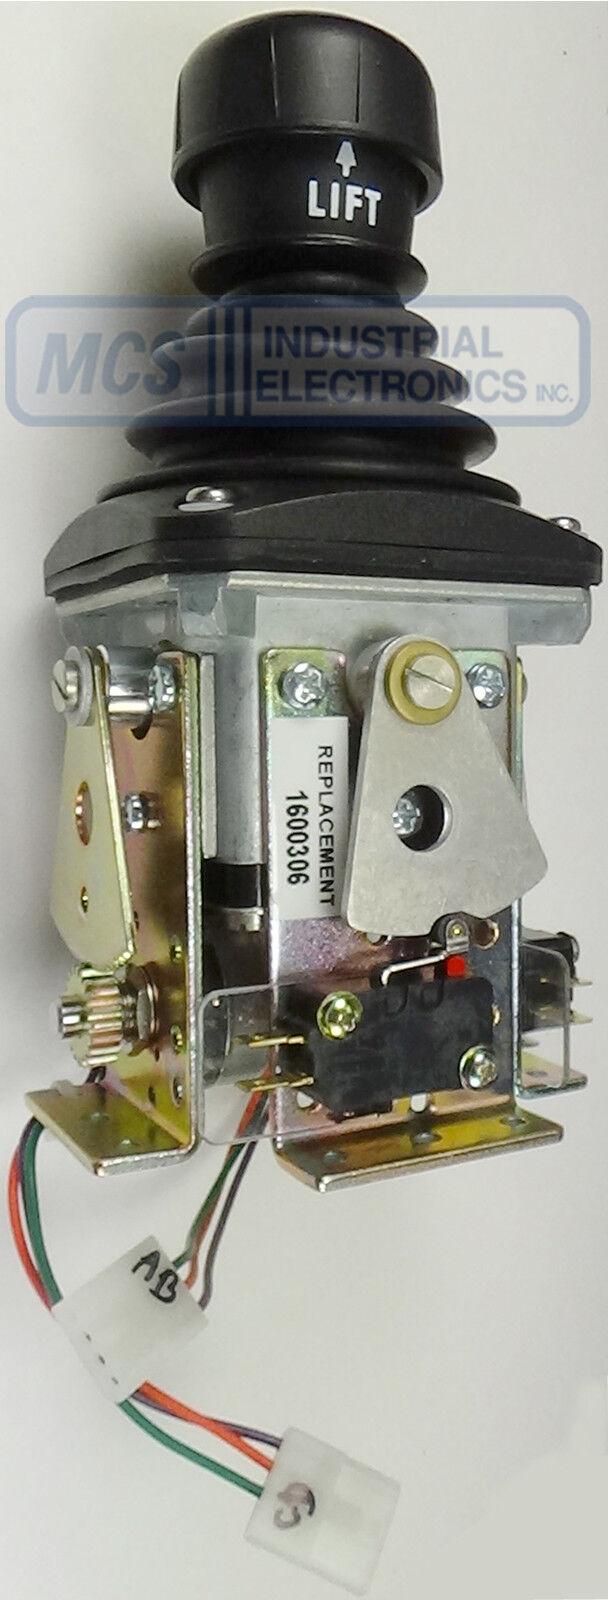 Pololu QTR-HD-02A Reflectance Sensor 2-Channel 4mm Pitch Analog Output PO4202